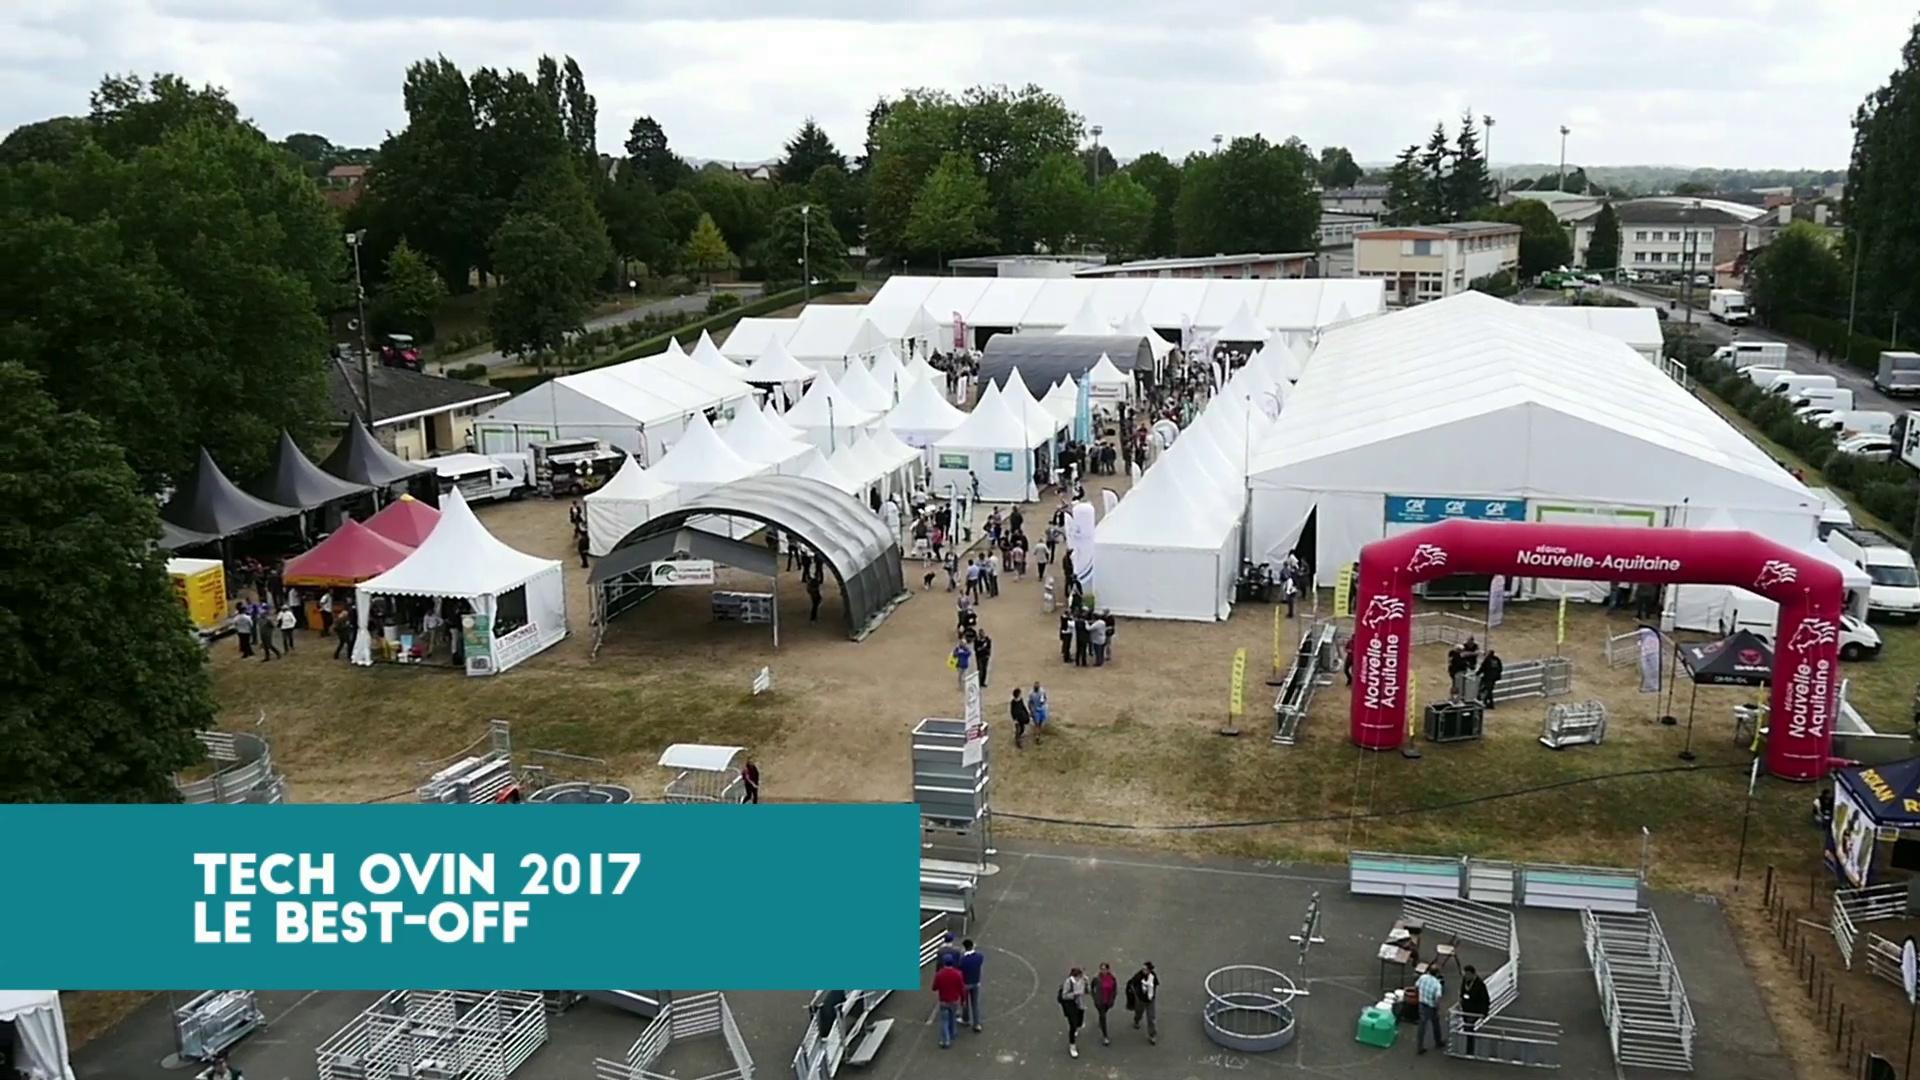 Tech Ovin 2017